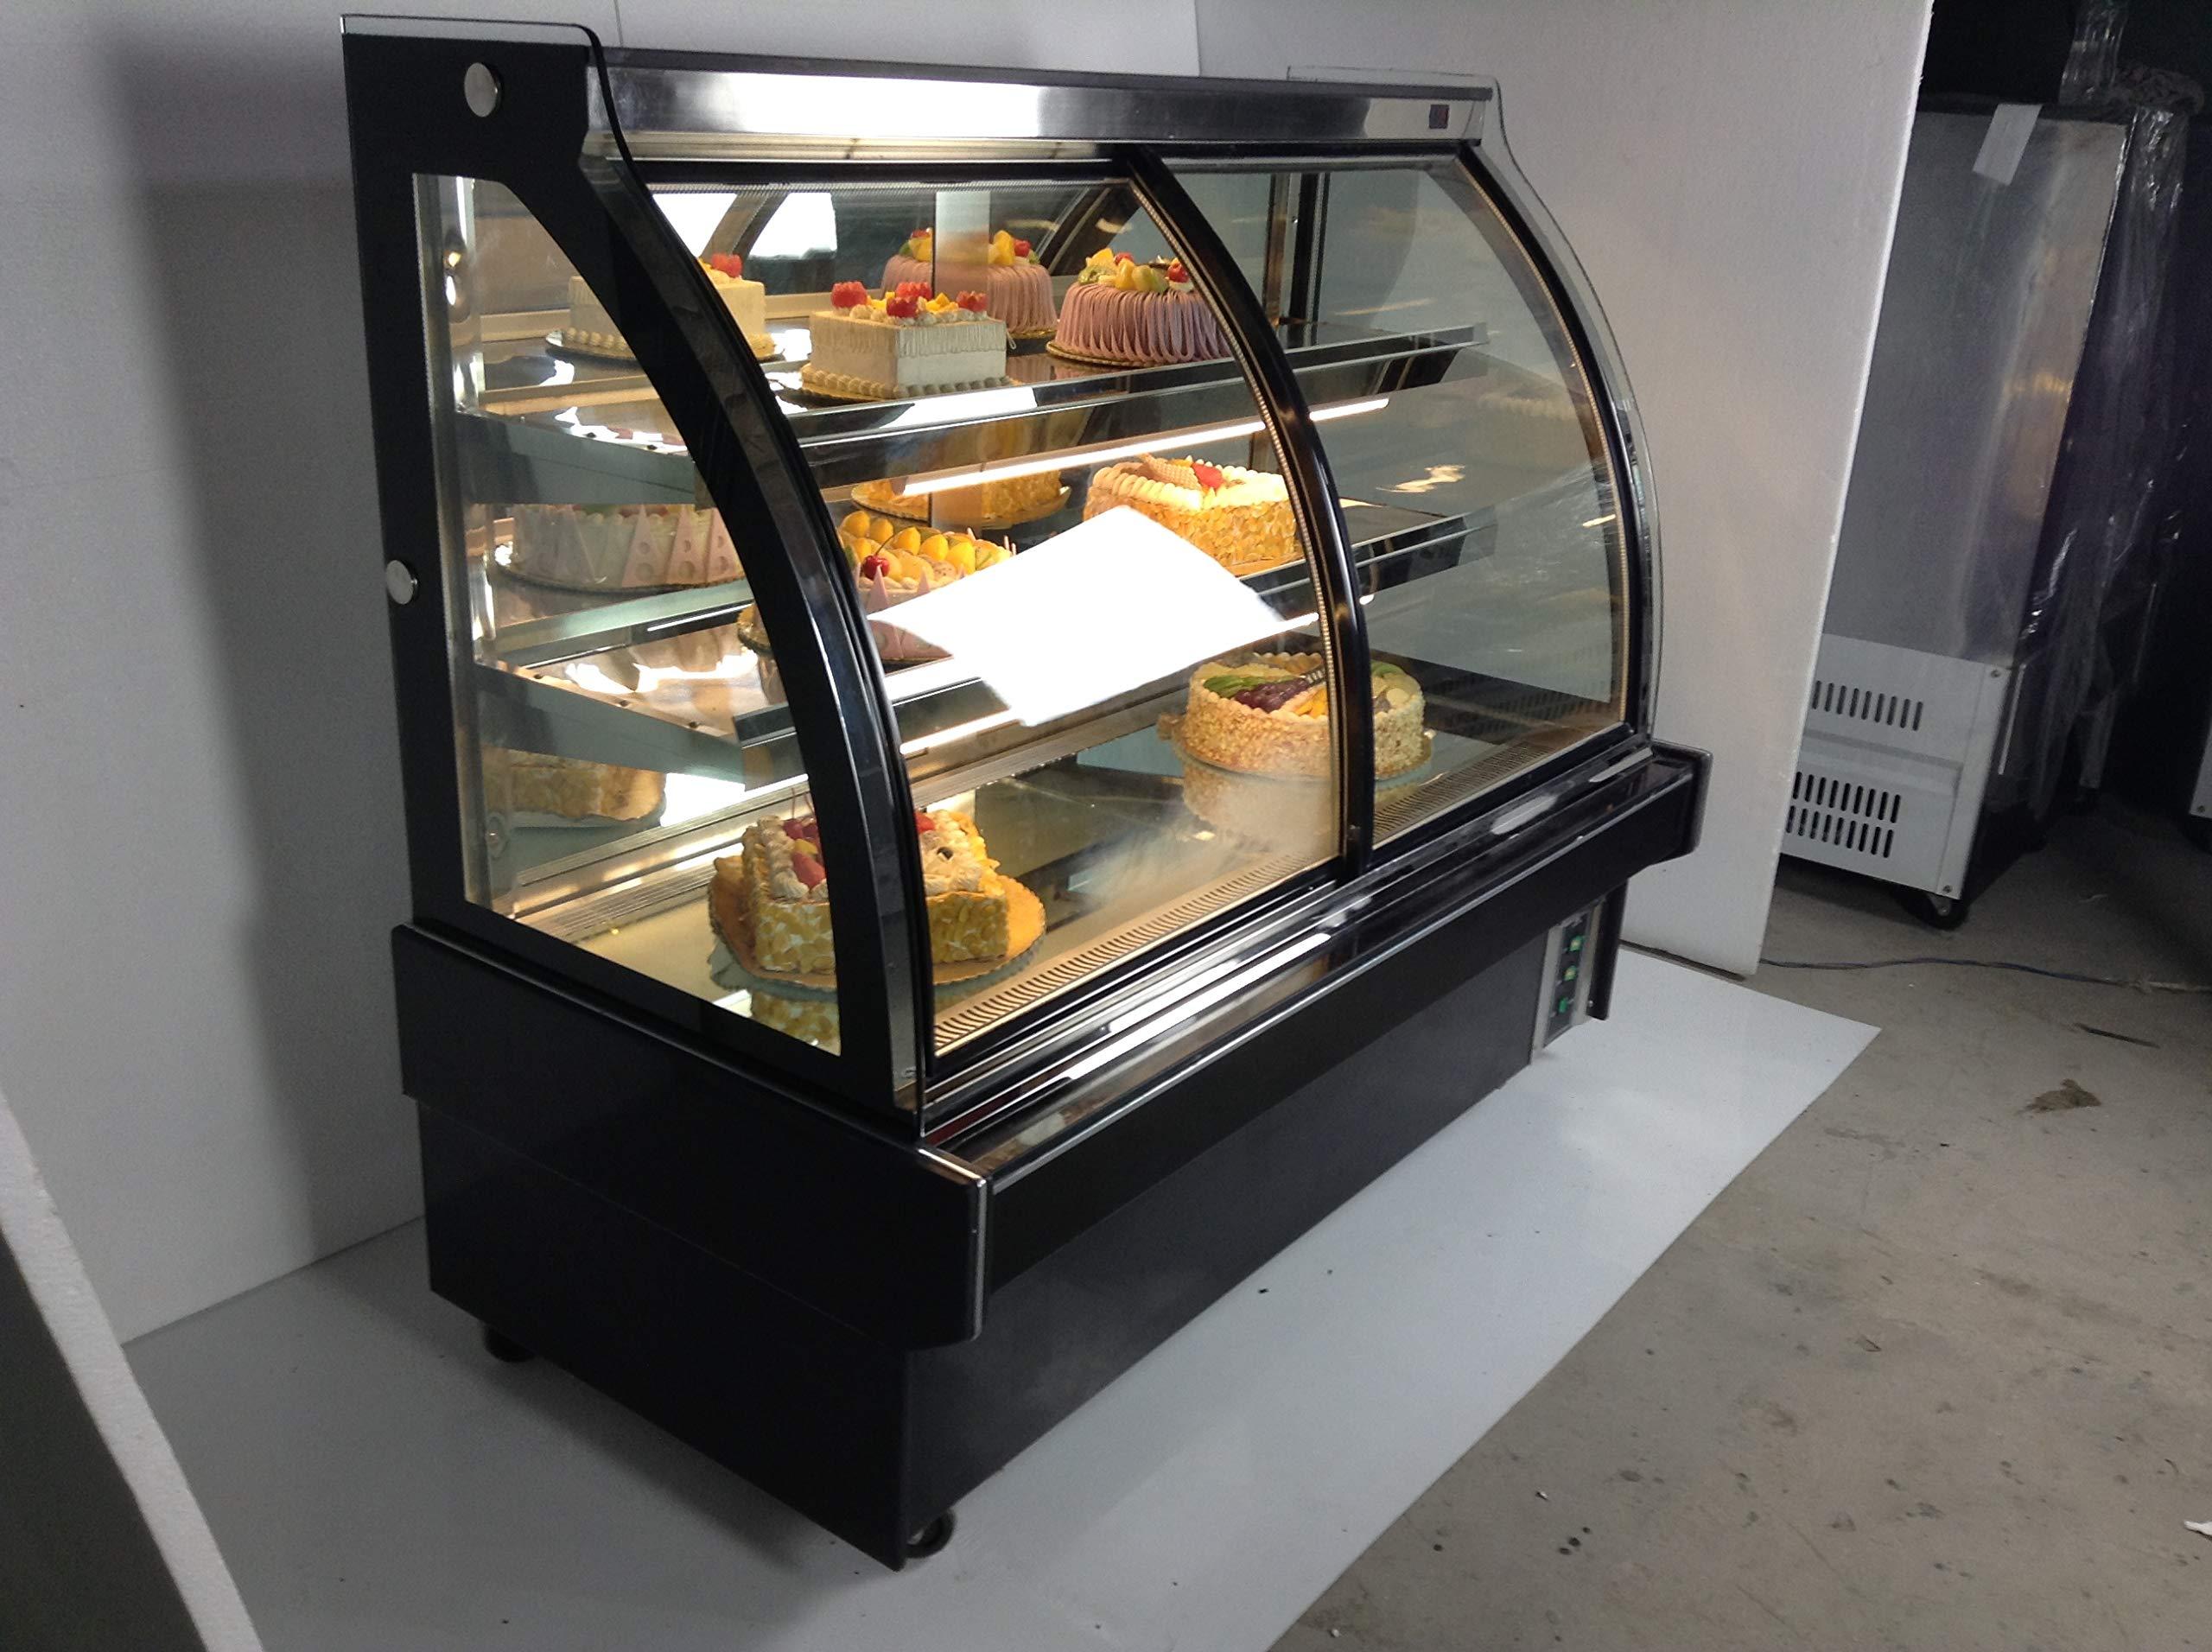 INTBUYING Commercial Display Case 20V Refrigerator Cake Showcase ...